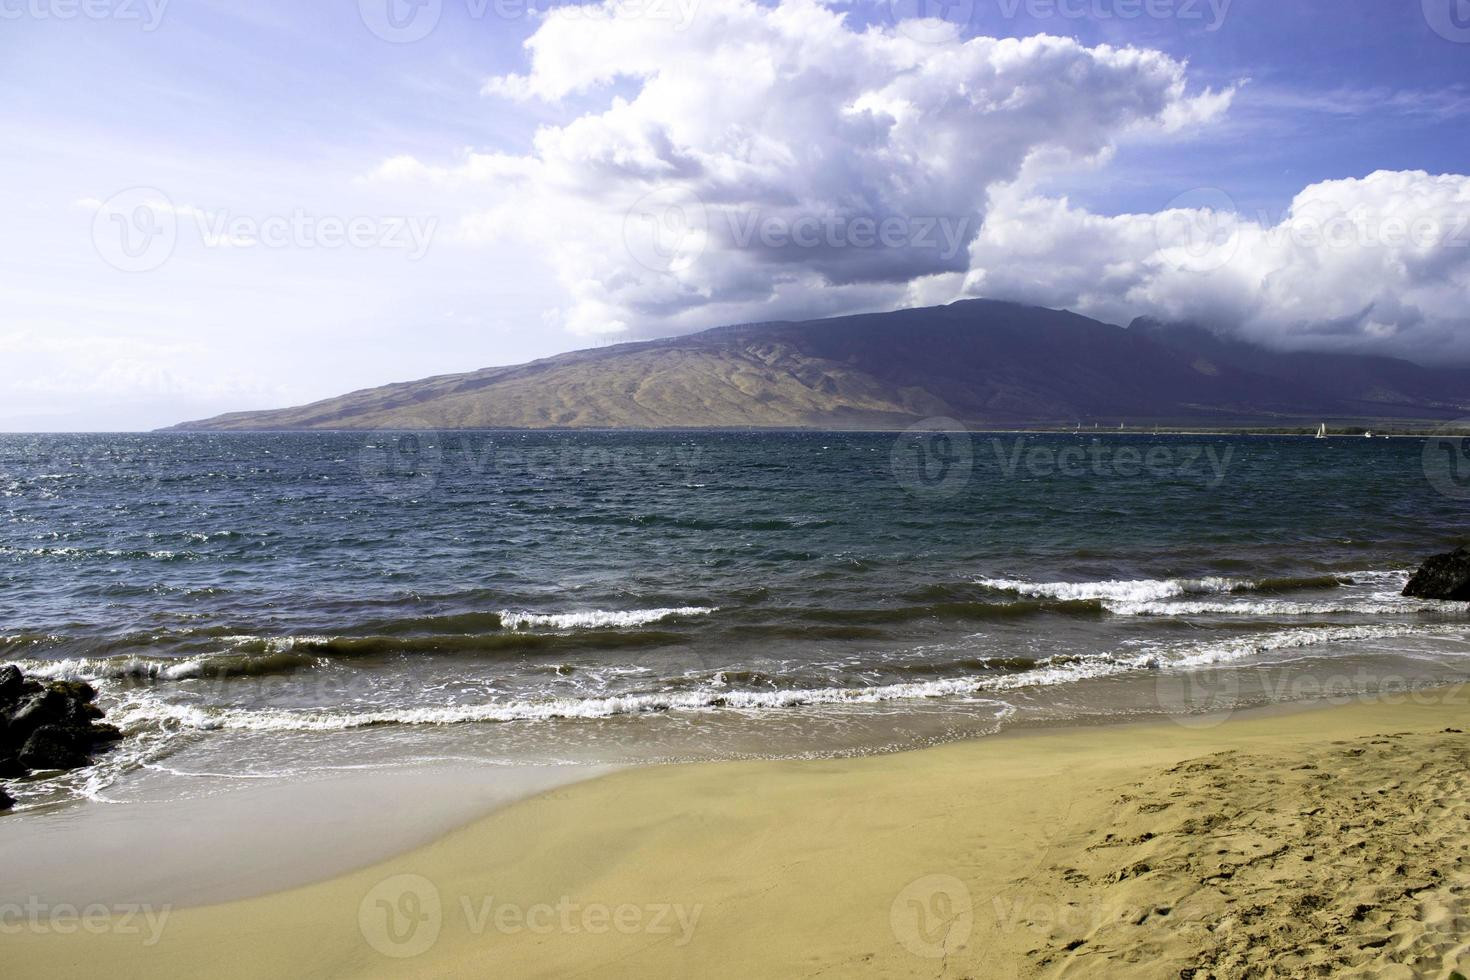 Lanai uitzicht vanaf het eiland Maui foto